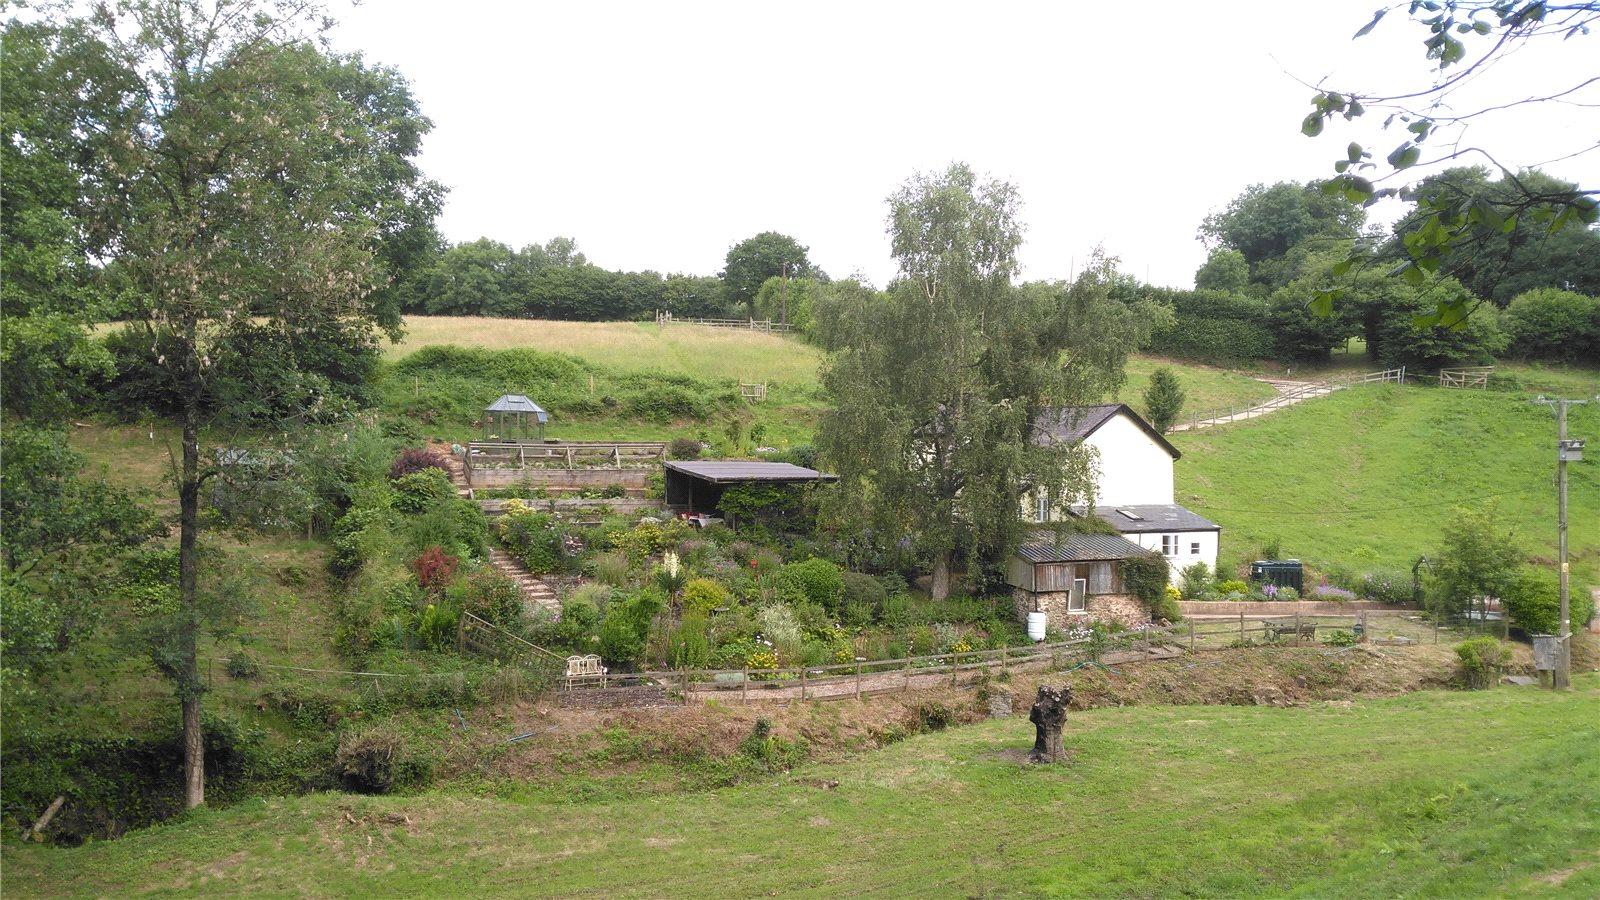 Single Family Home for Sale at Way Village, Tiverton, Devon, EX16 Tiverton, England